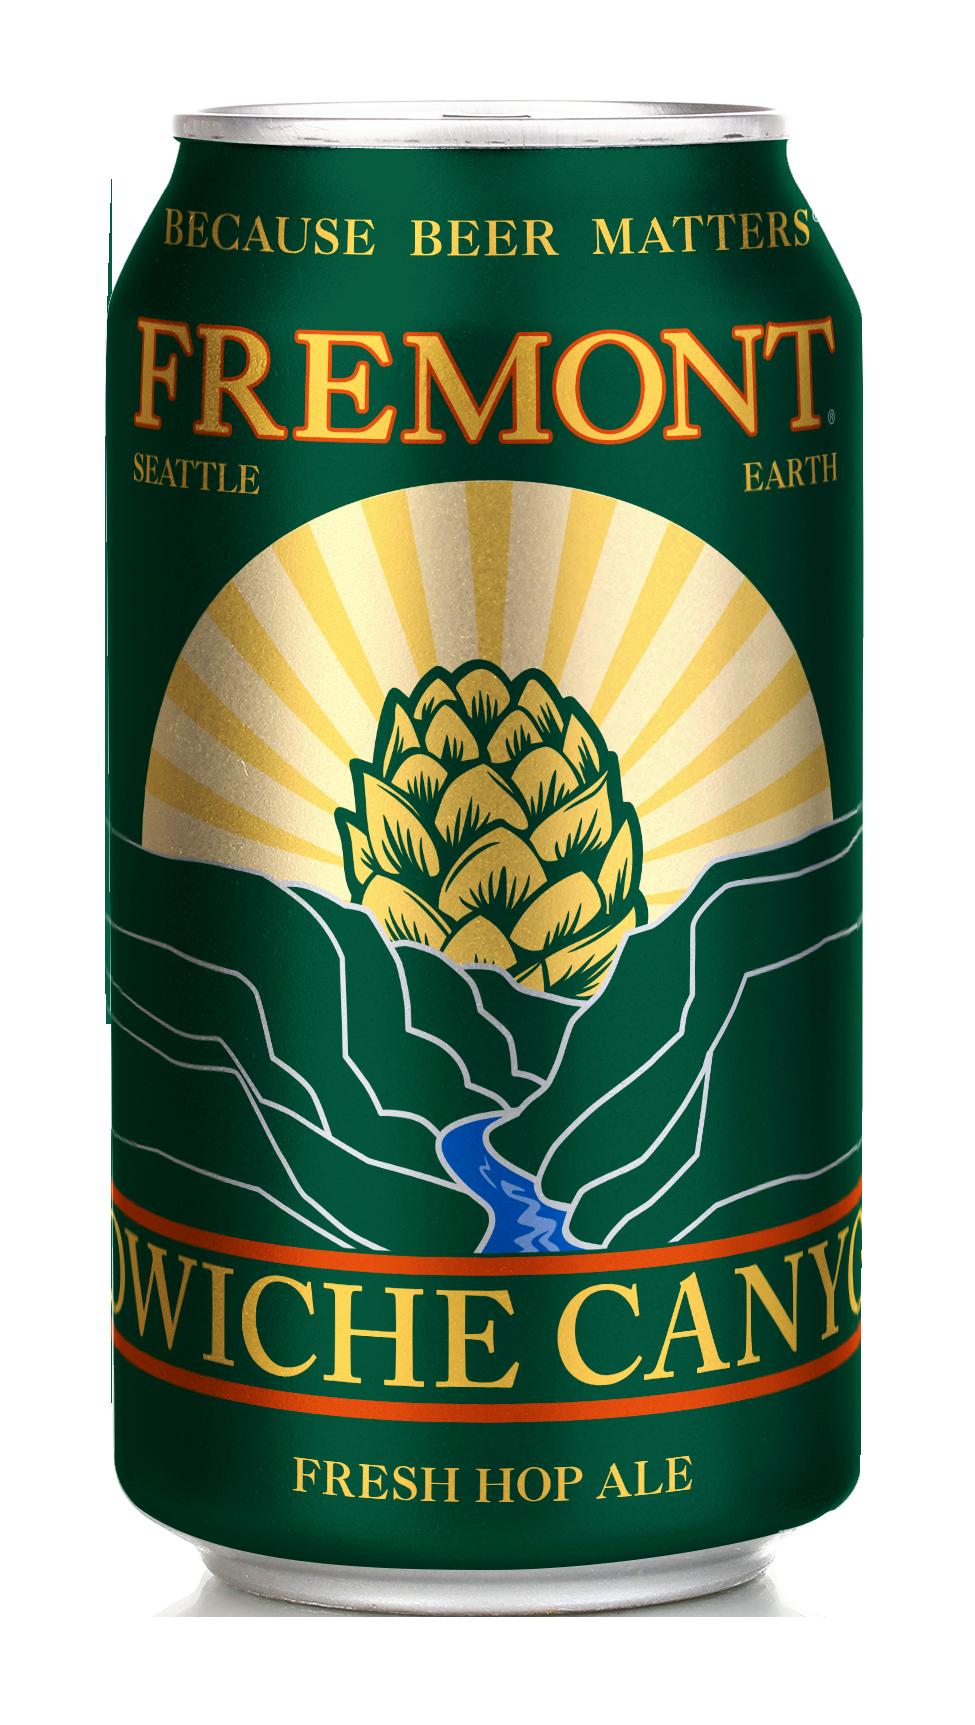 Cowiche Canyon Fresh Hop Ale